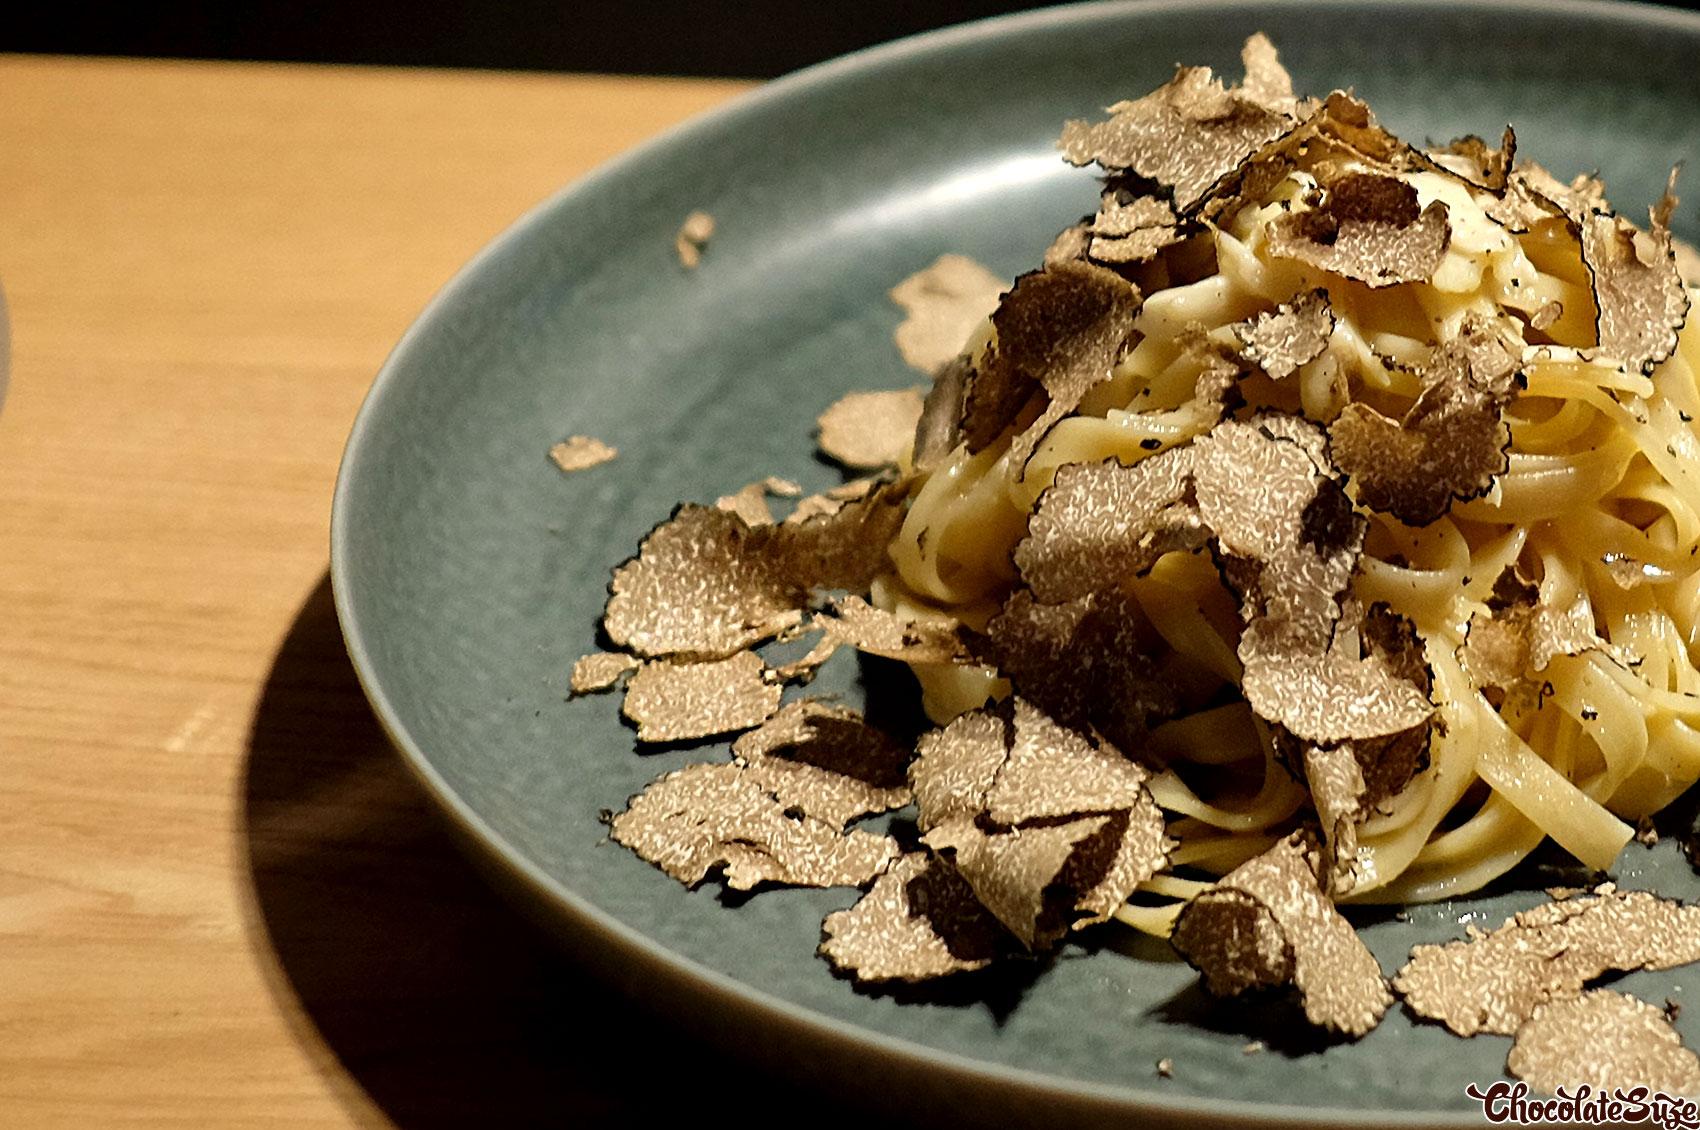 Truffle pasta at OUT Restaurant, Shibuya, Tokyo